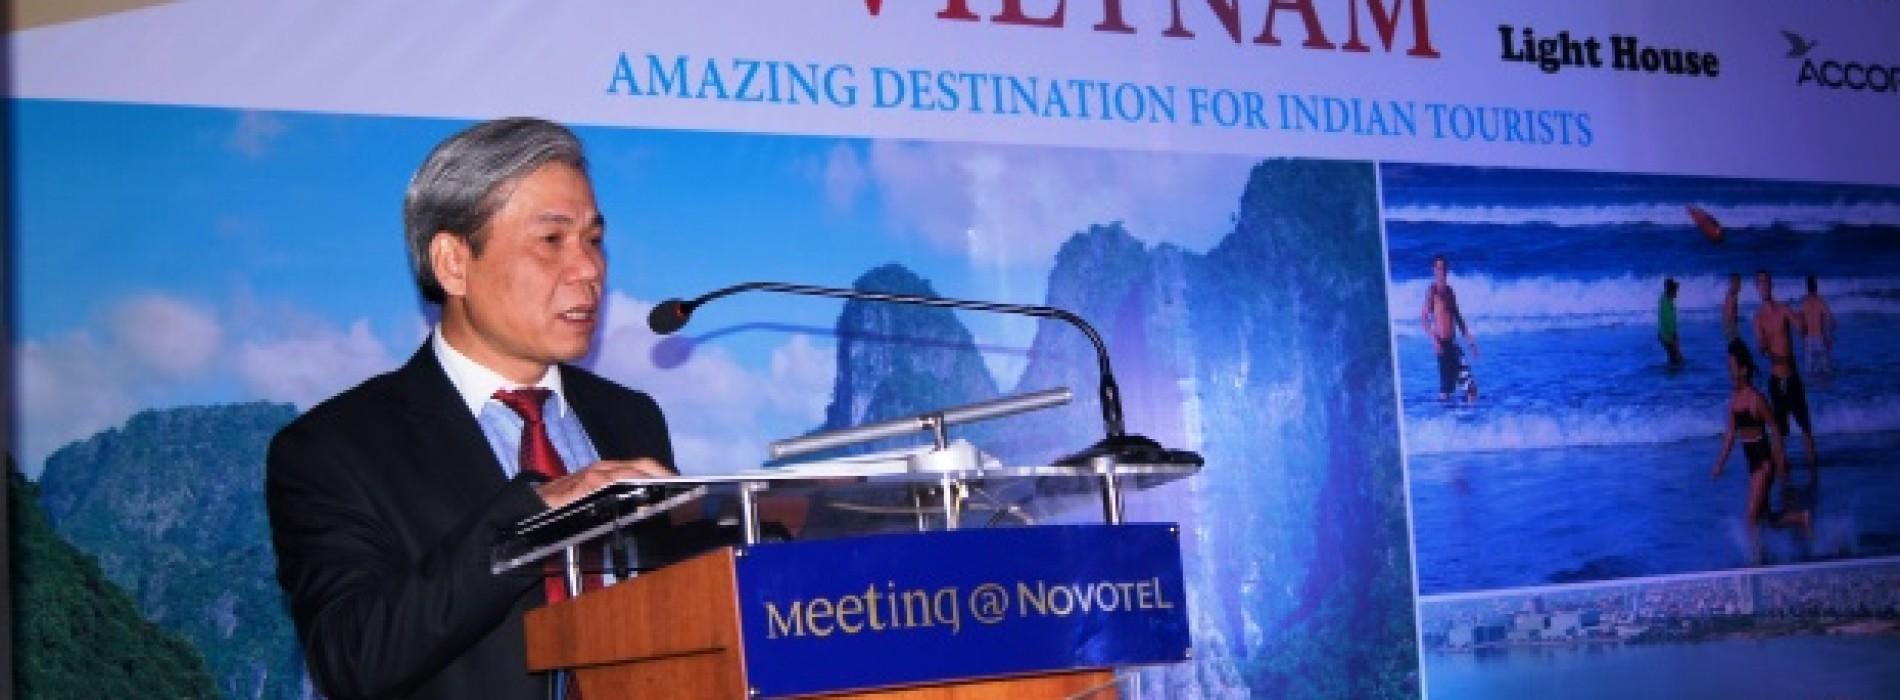 Historic Vietnam comes calling for Min tourists